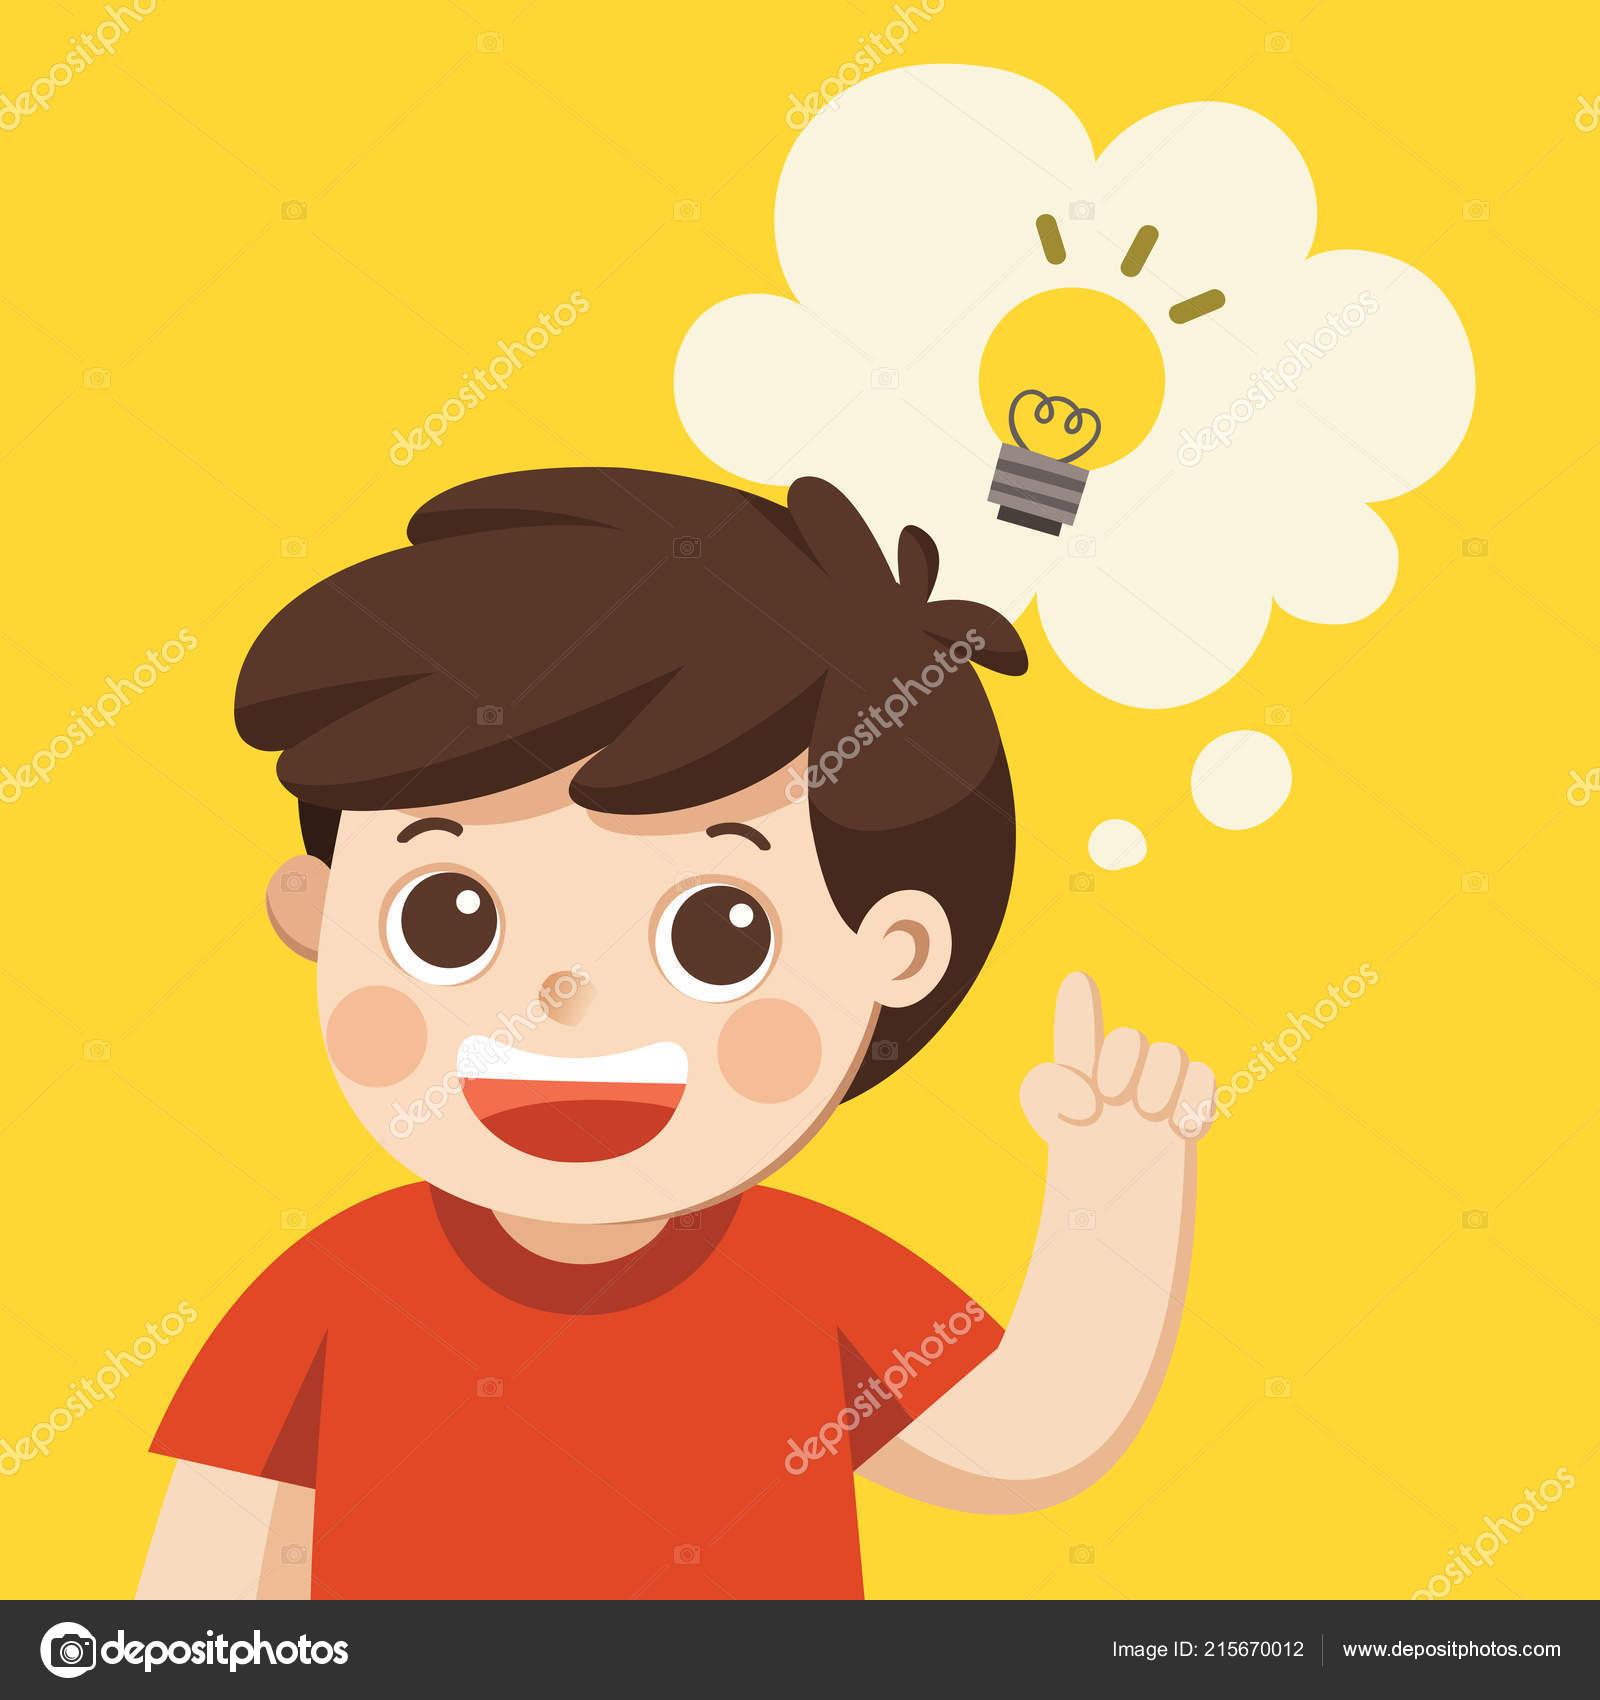 Áˆ Thinking Boy Cartoon Stock Pictures Royalty Free Cartoon Boy Thinking Illustrations Download On Depositphotos